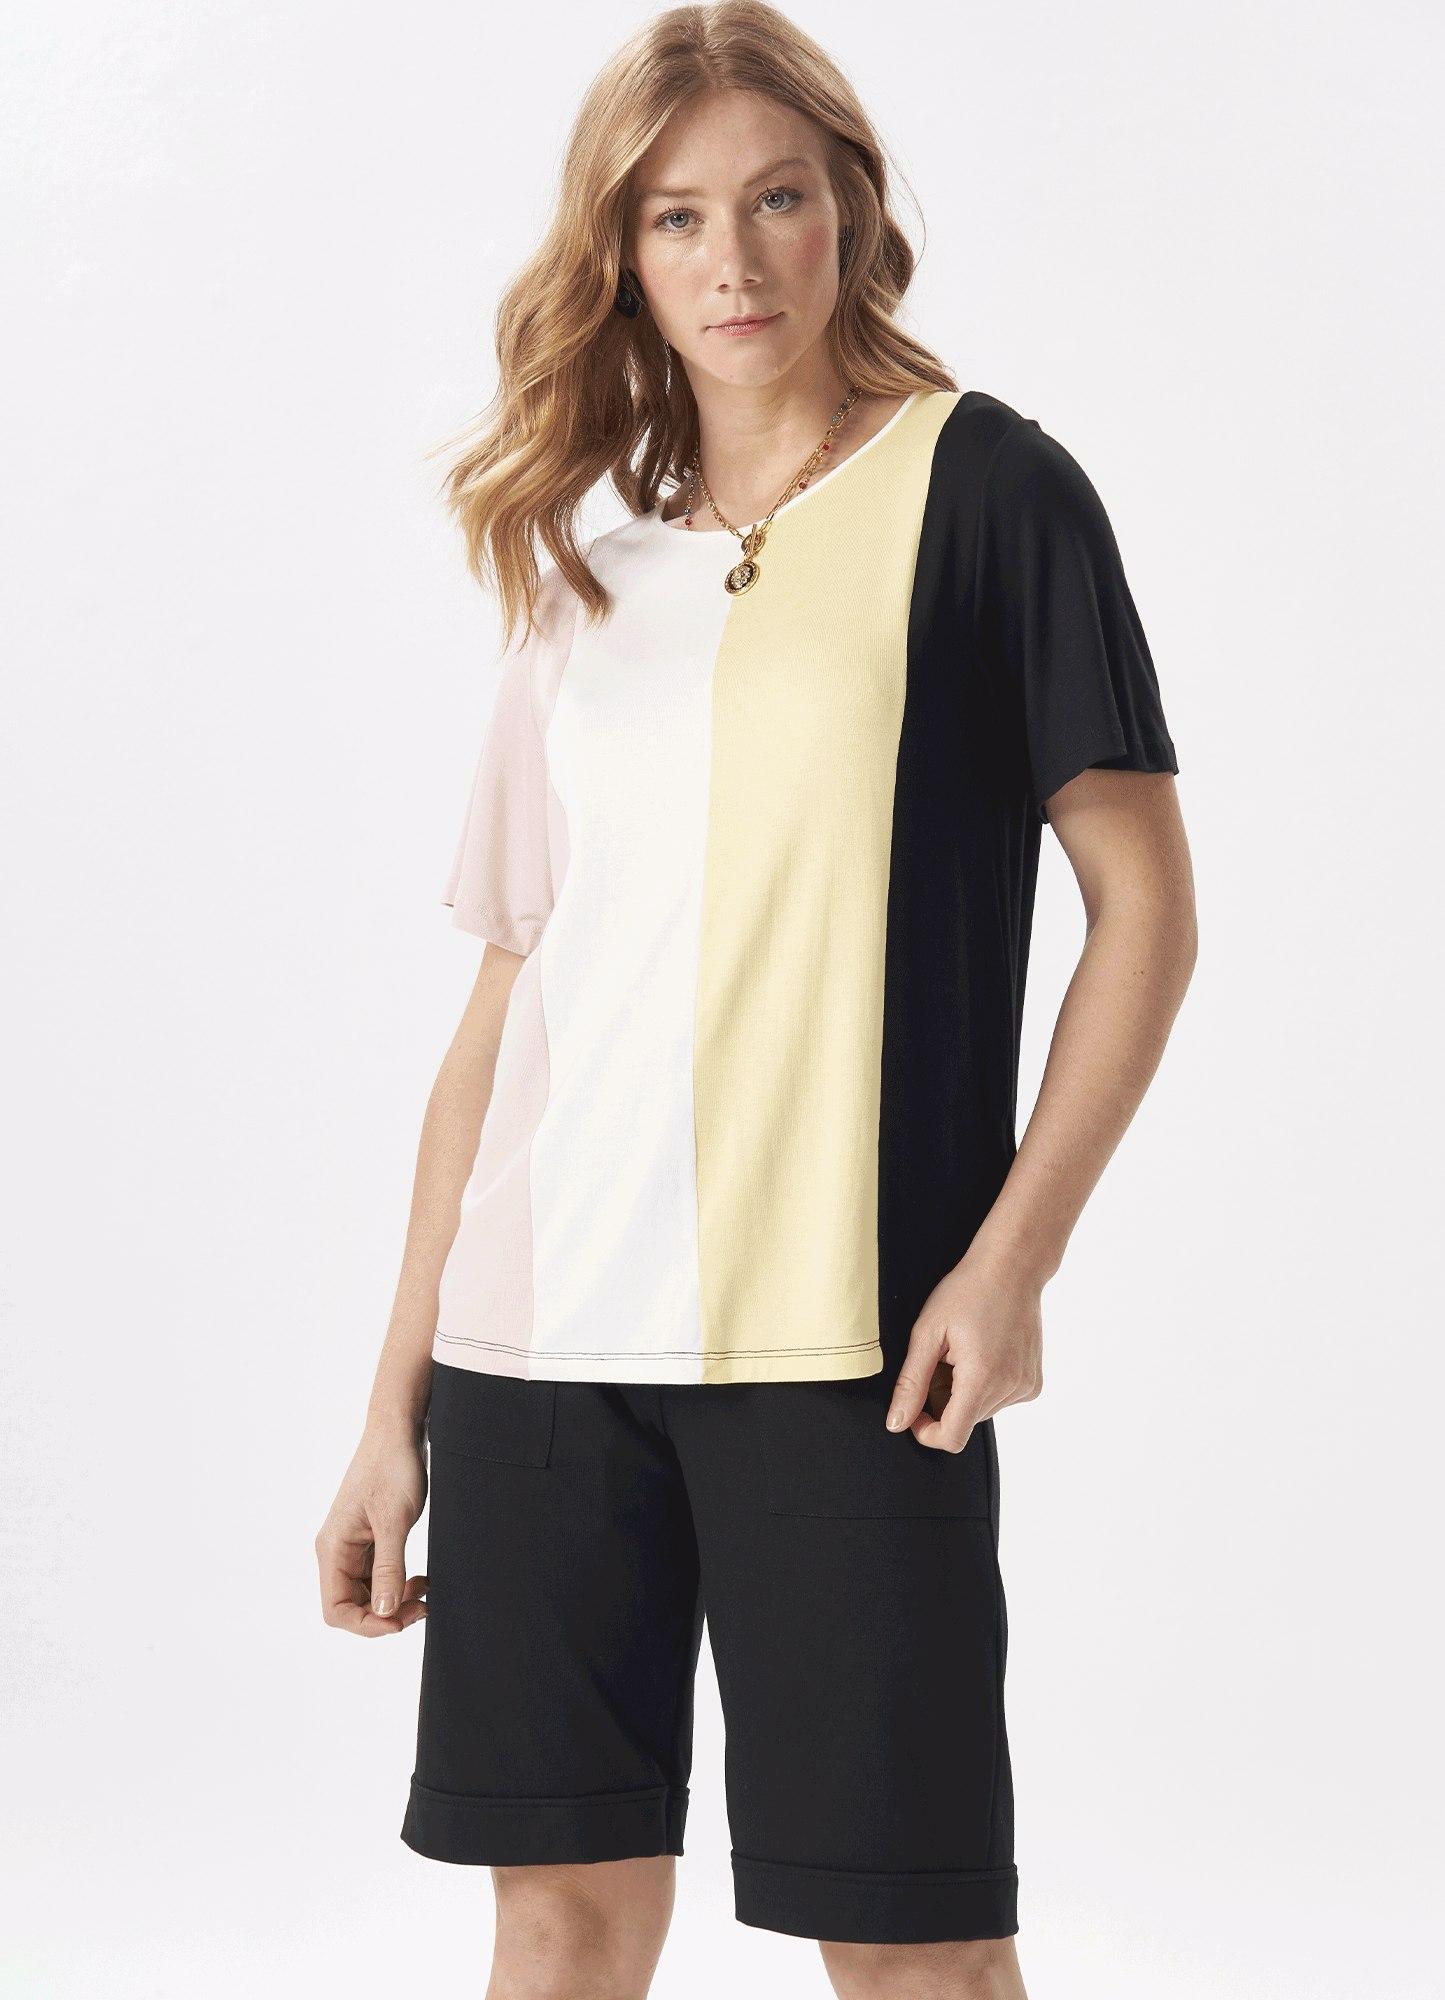 Blusa Feminina Malha Bloco de cores Decote Redondo